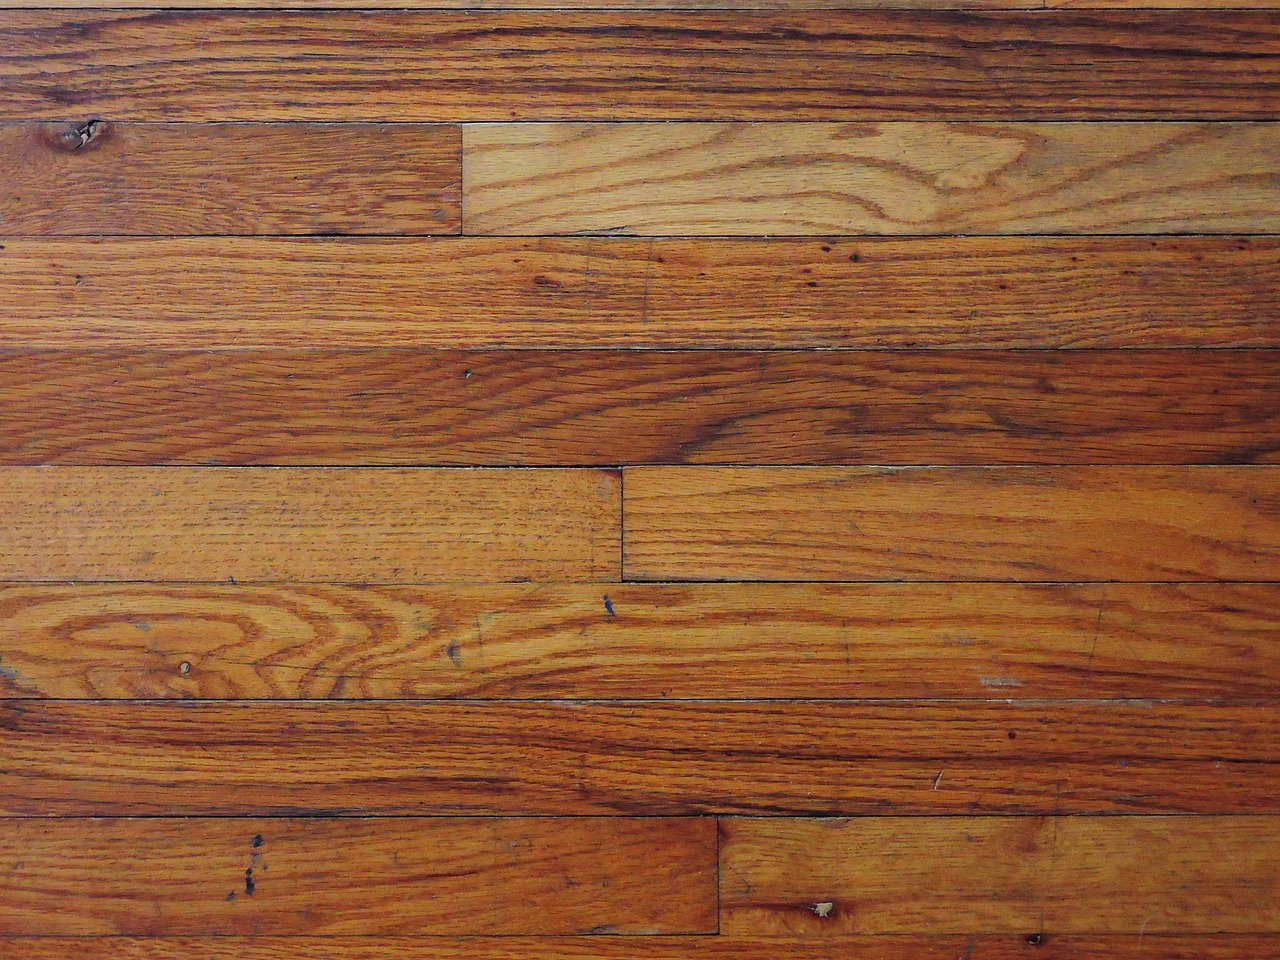 Antique Wood Floor Free Picture